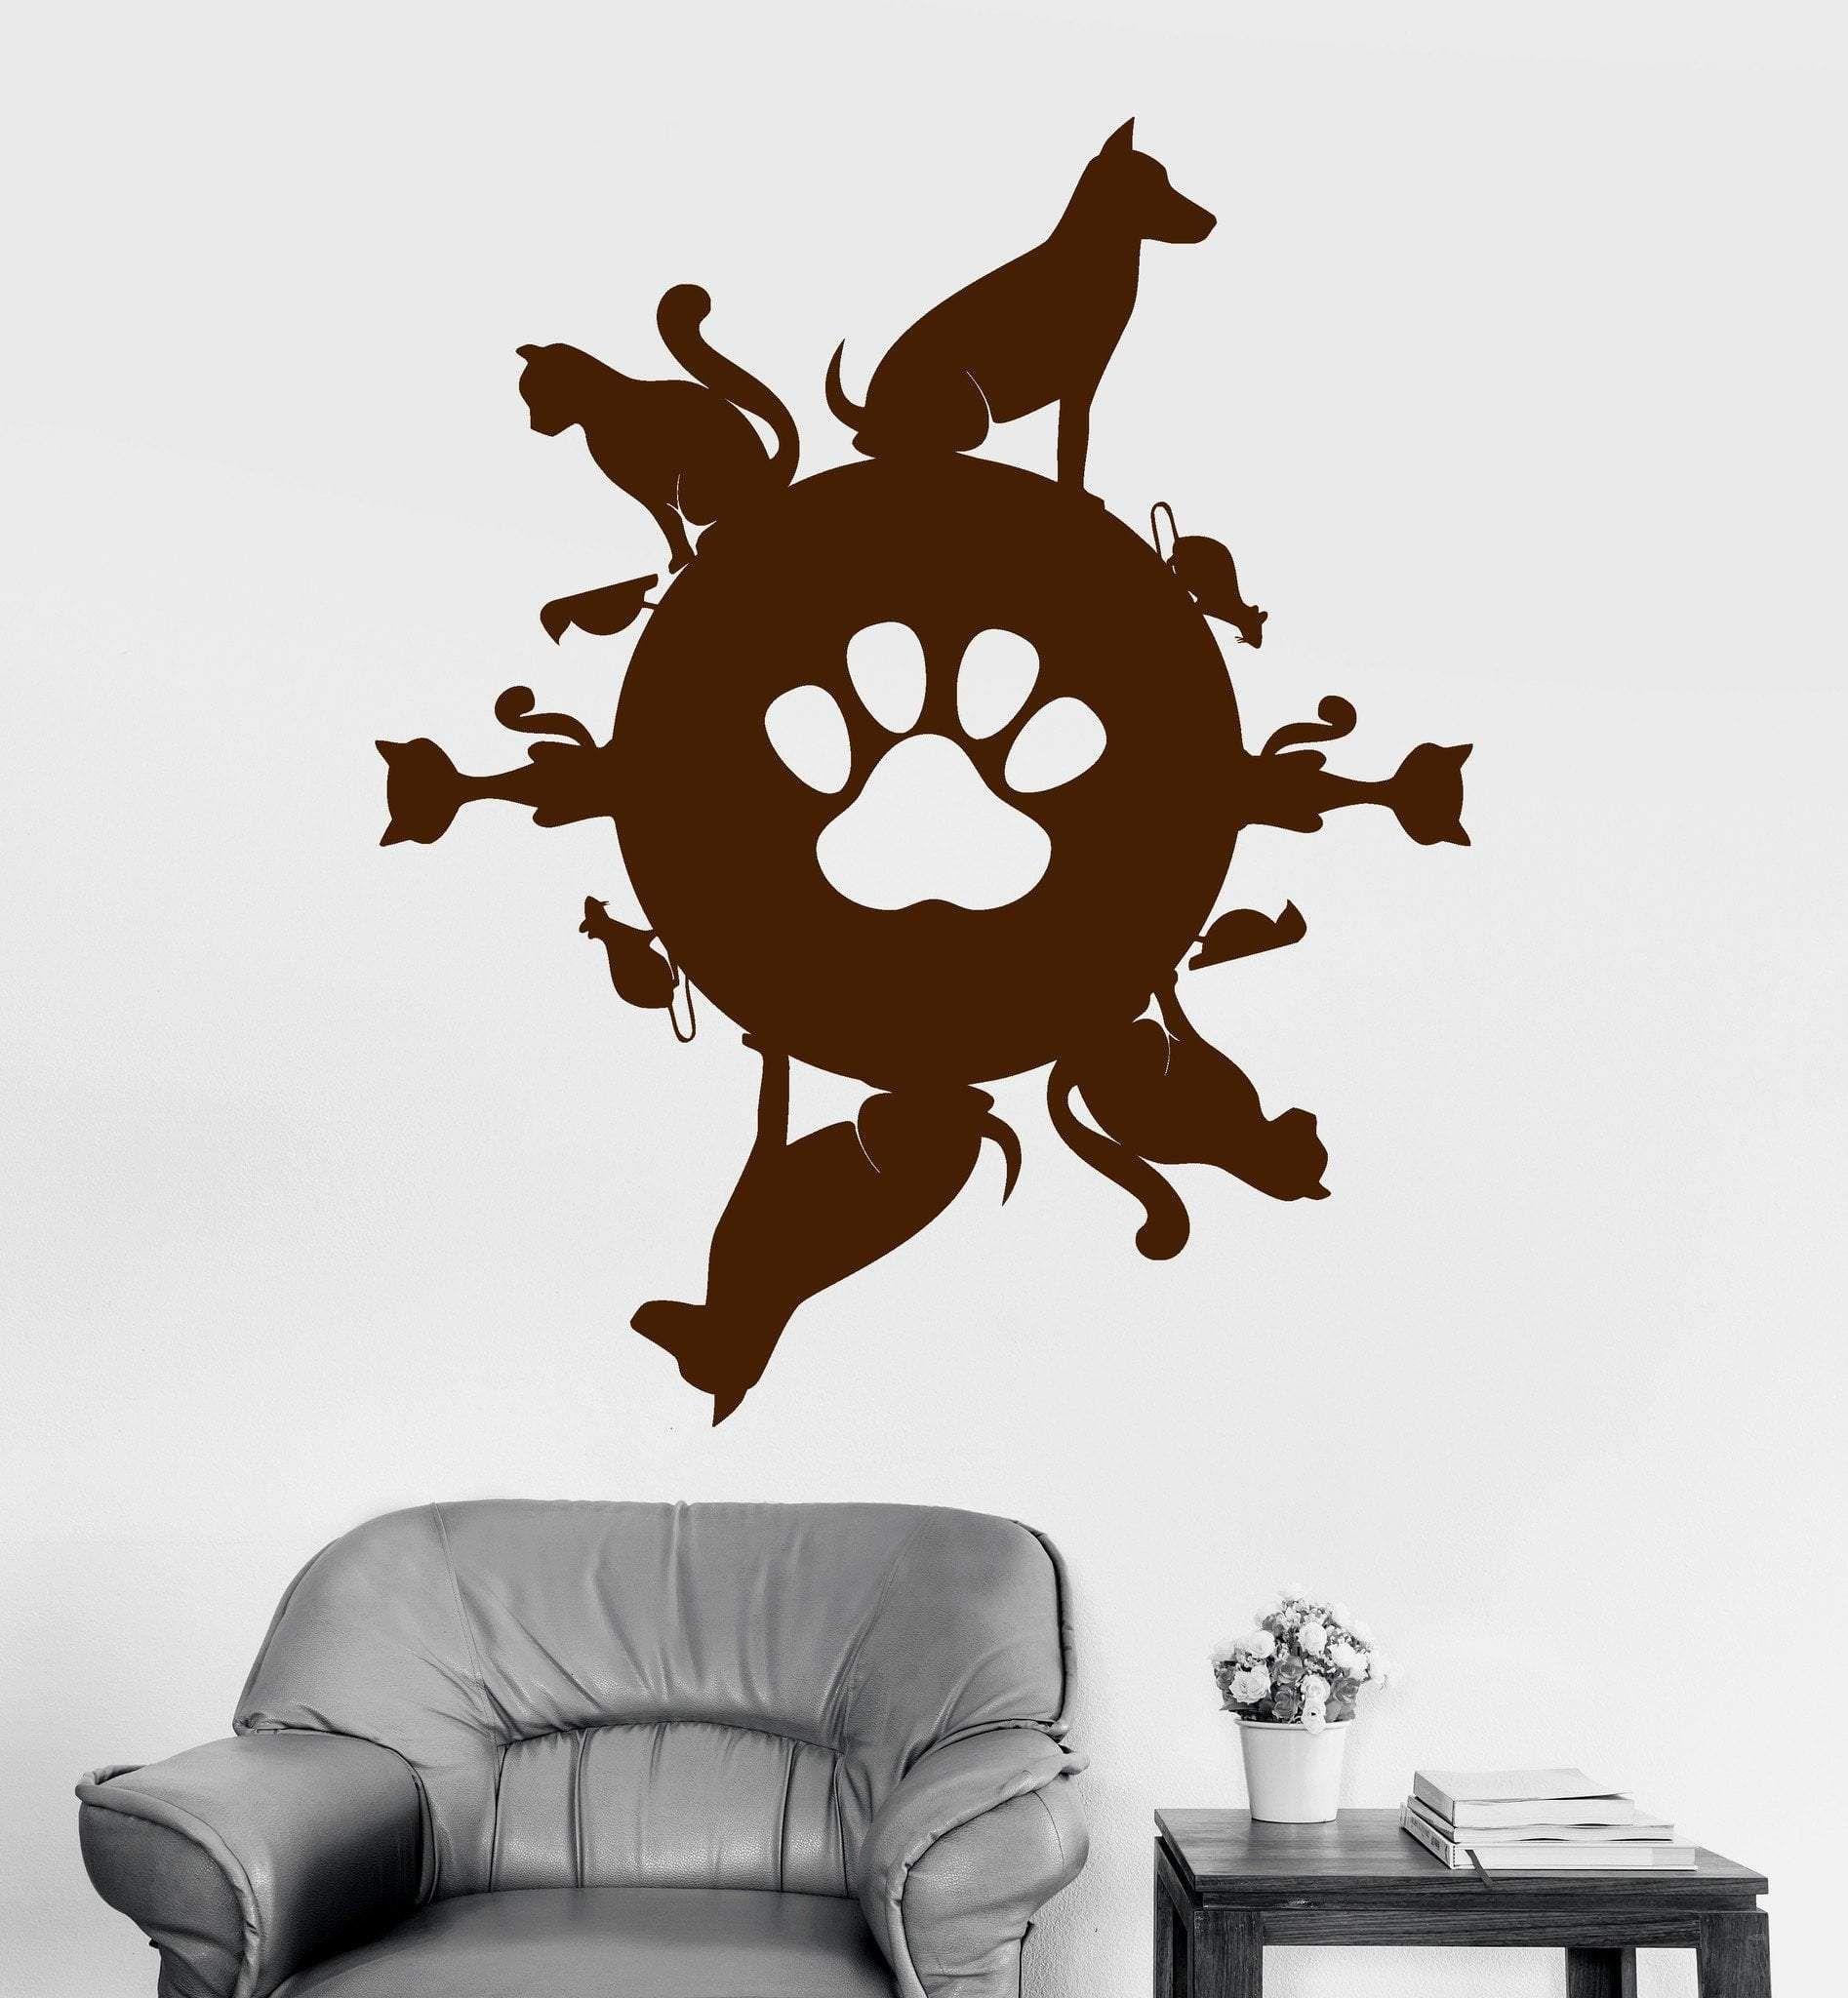 Vinyl Wall Decal Pet Planet Animal Shop Cat Dog Stickers Mural Unique Gift Ig3797 Pet Shop Pets Dog Stickers